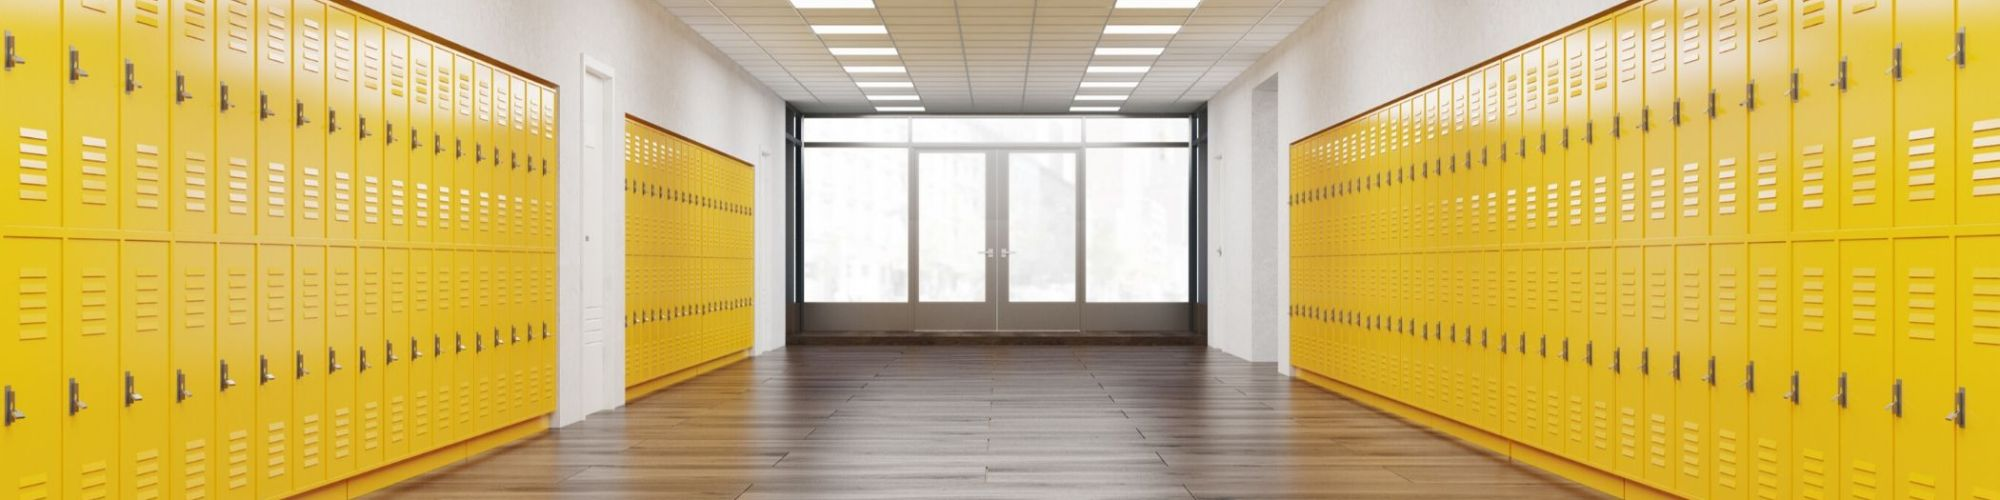 Empty hallway with lockers